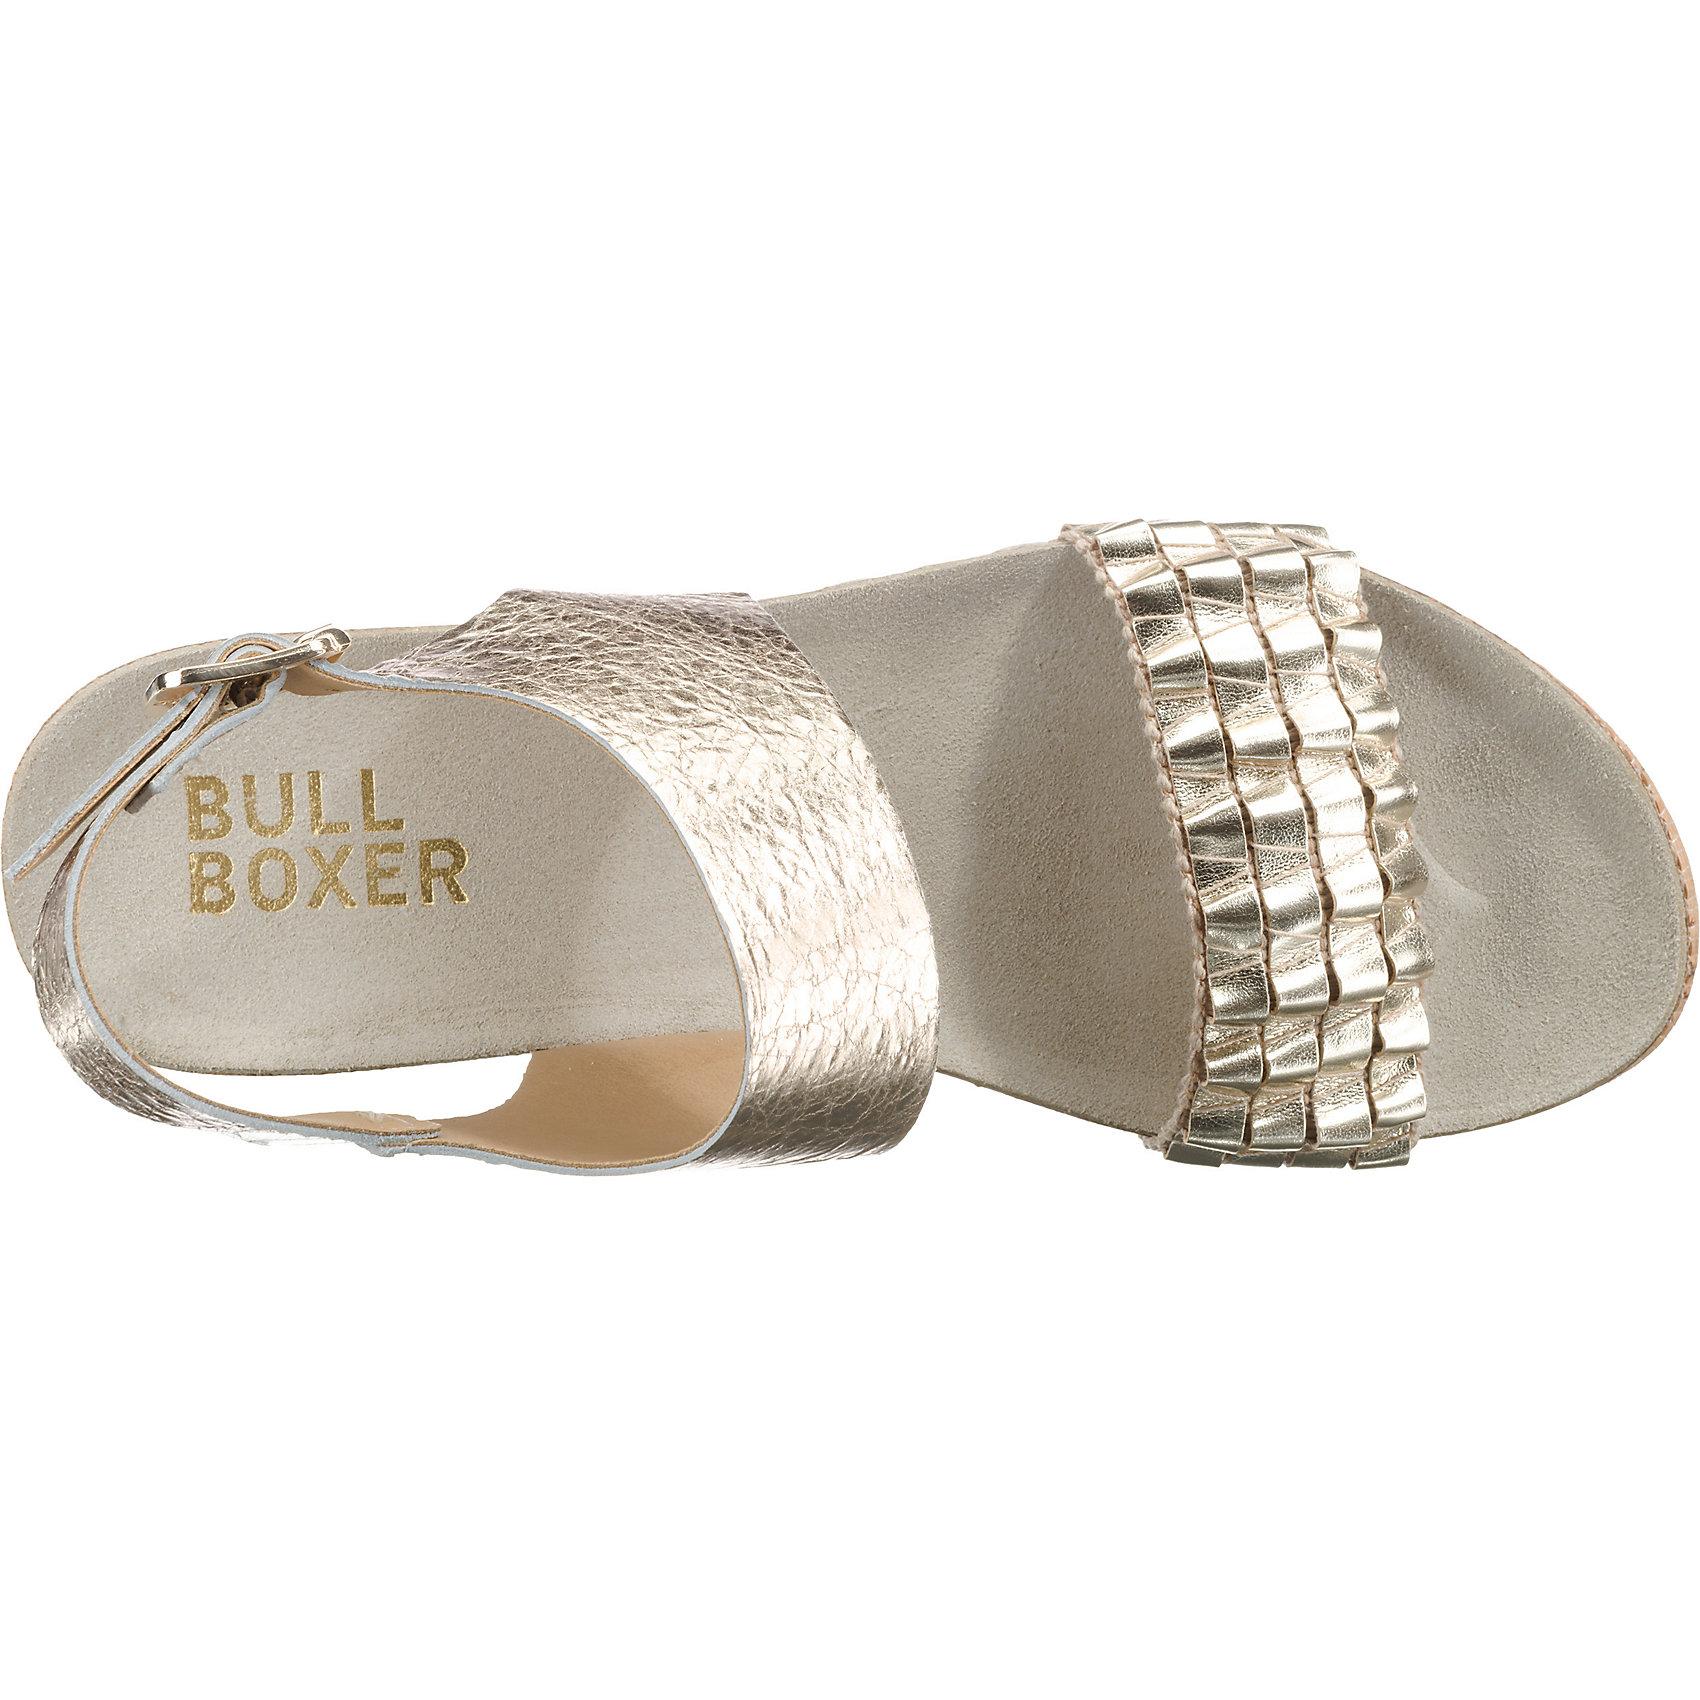 Neu BULLBOXER RiemchenSandaleeen 7409369 für Damen silber gold